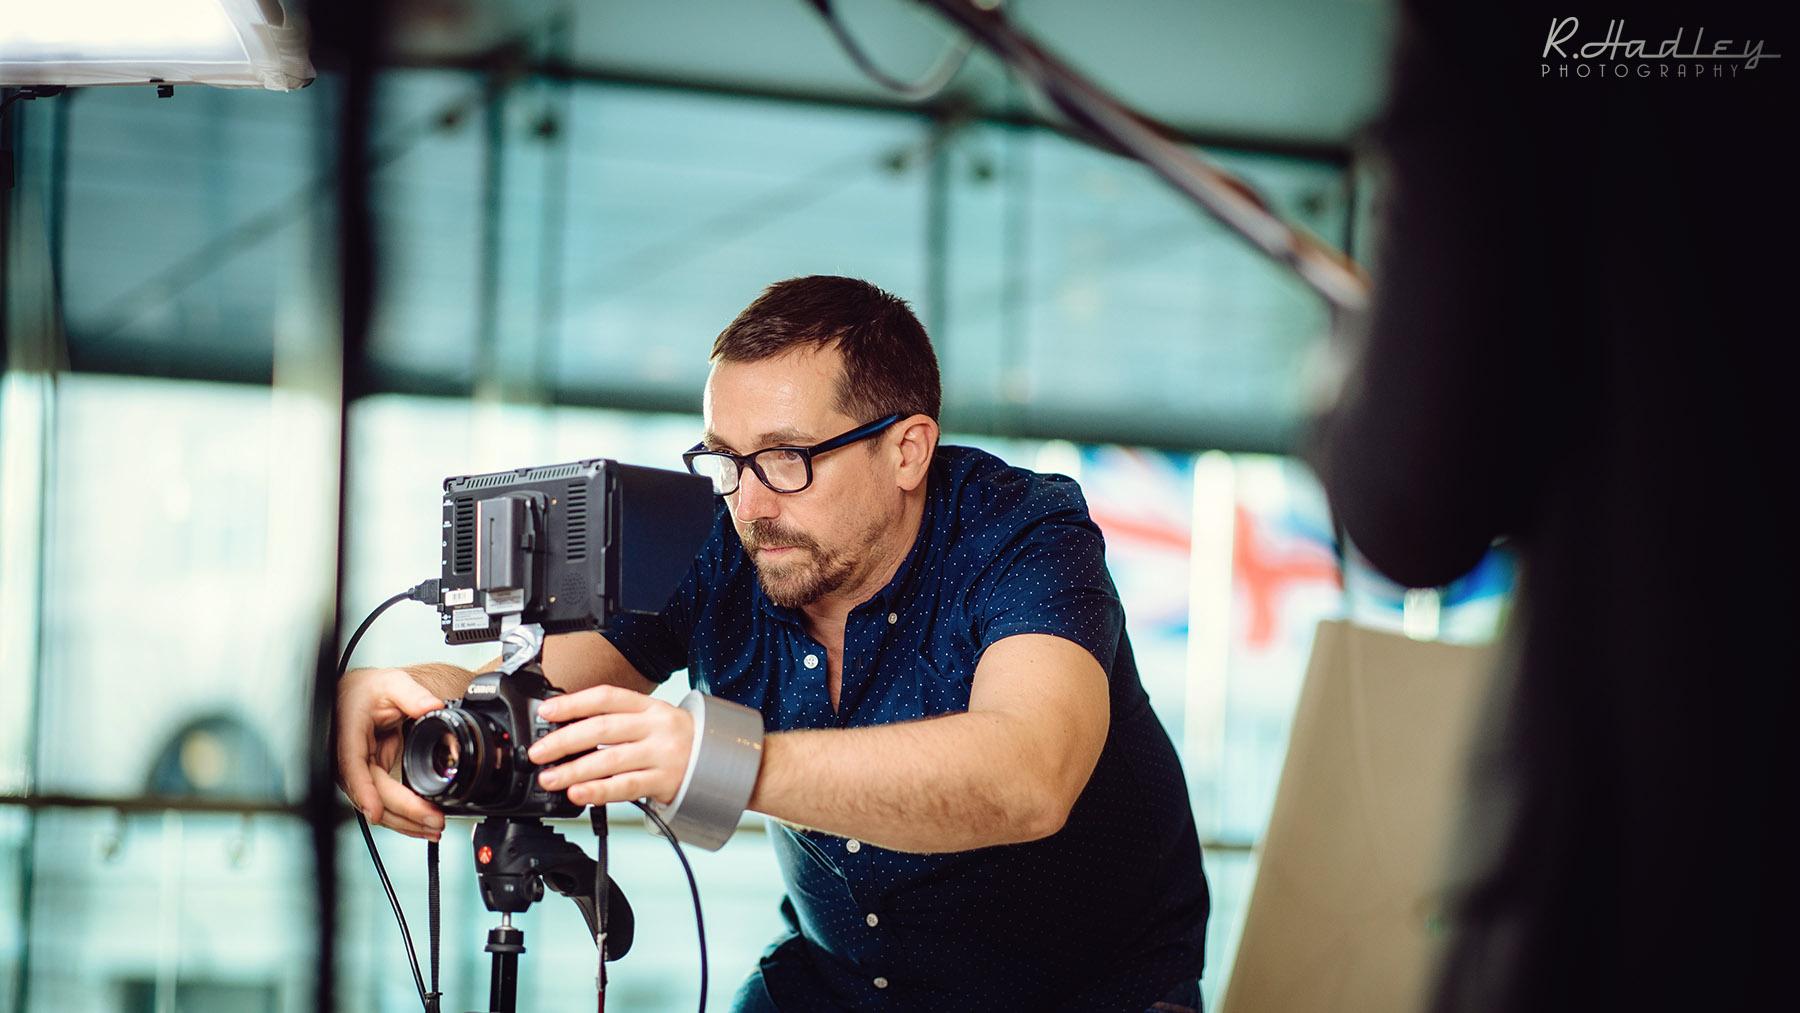 Xavi Montojo Jordan photographer assisting Carolina De Santis in London for a corporate event working with Canon camera